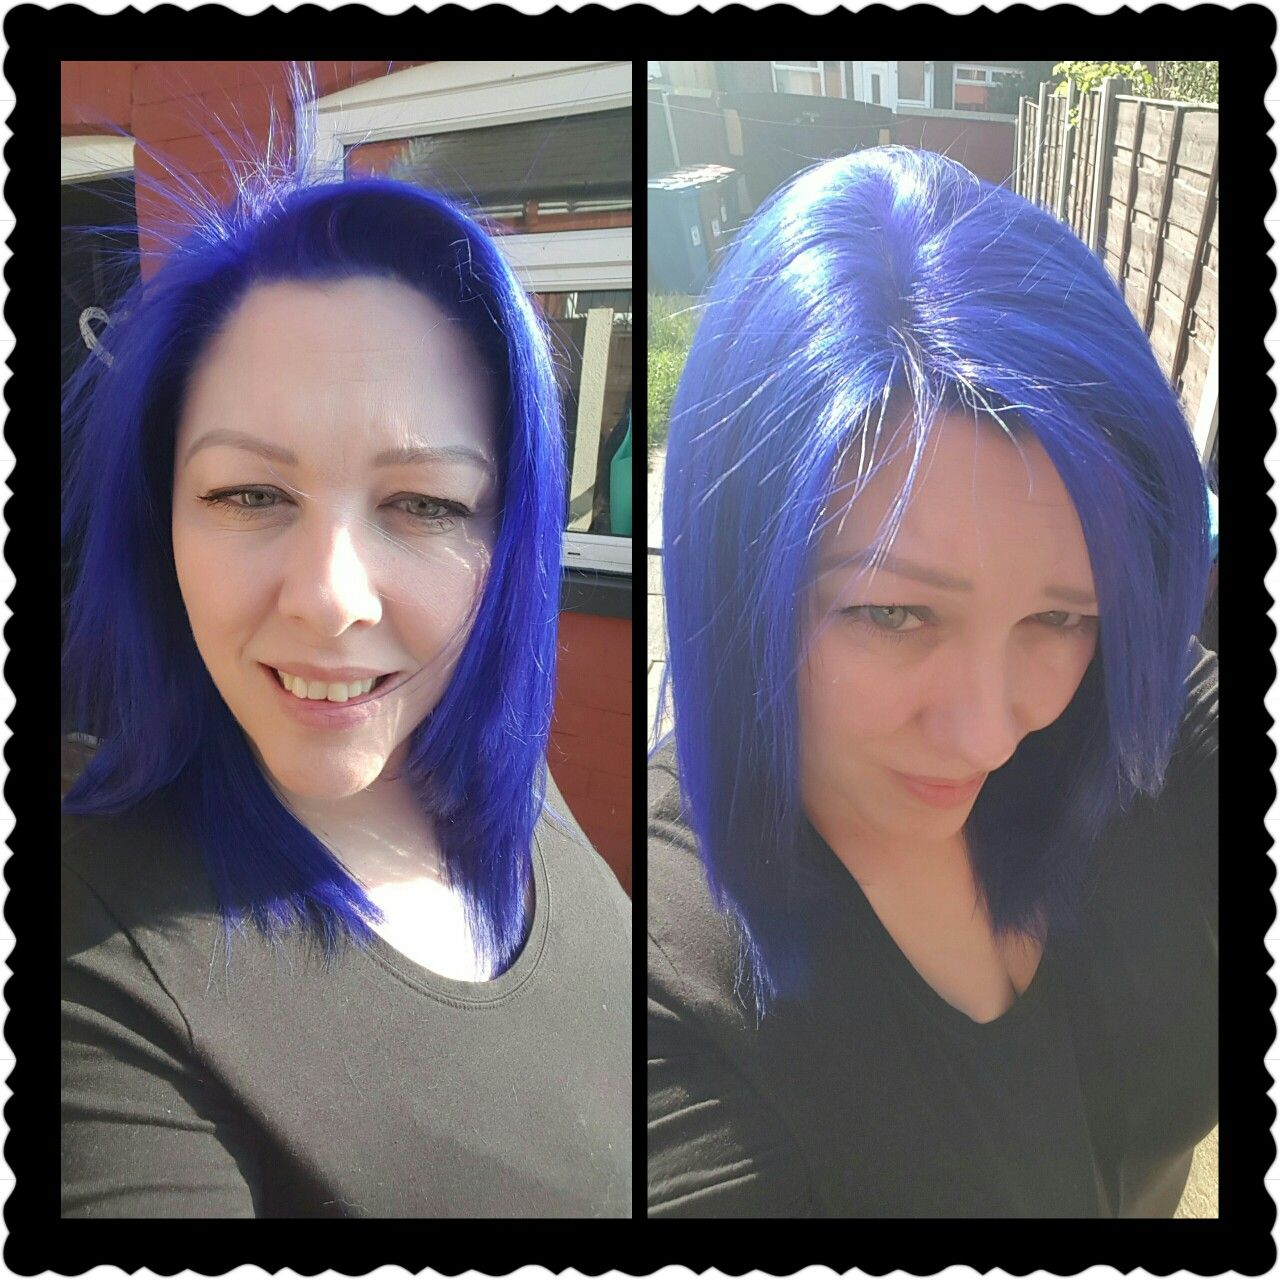 Loving My New Hair Colour Iroiro 30 Iro Violet 4oz On Bleached Hair Bleached Hair New Hair Colors Treatment For Bleached Hair